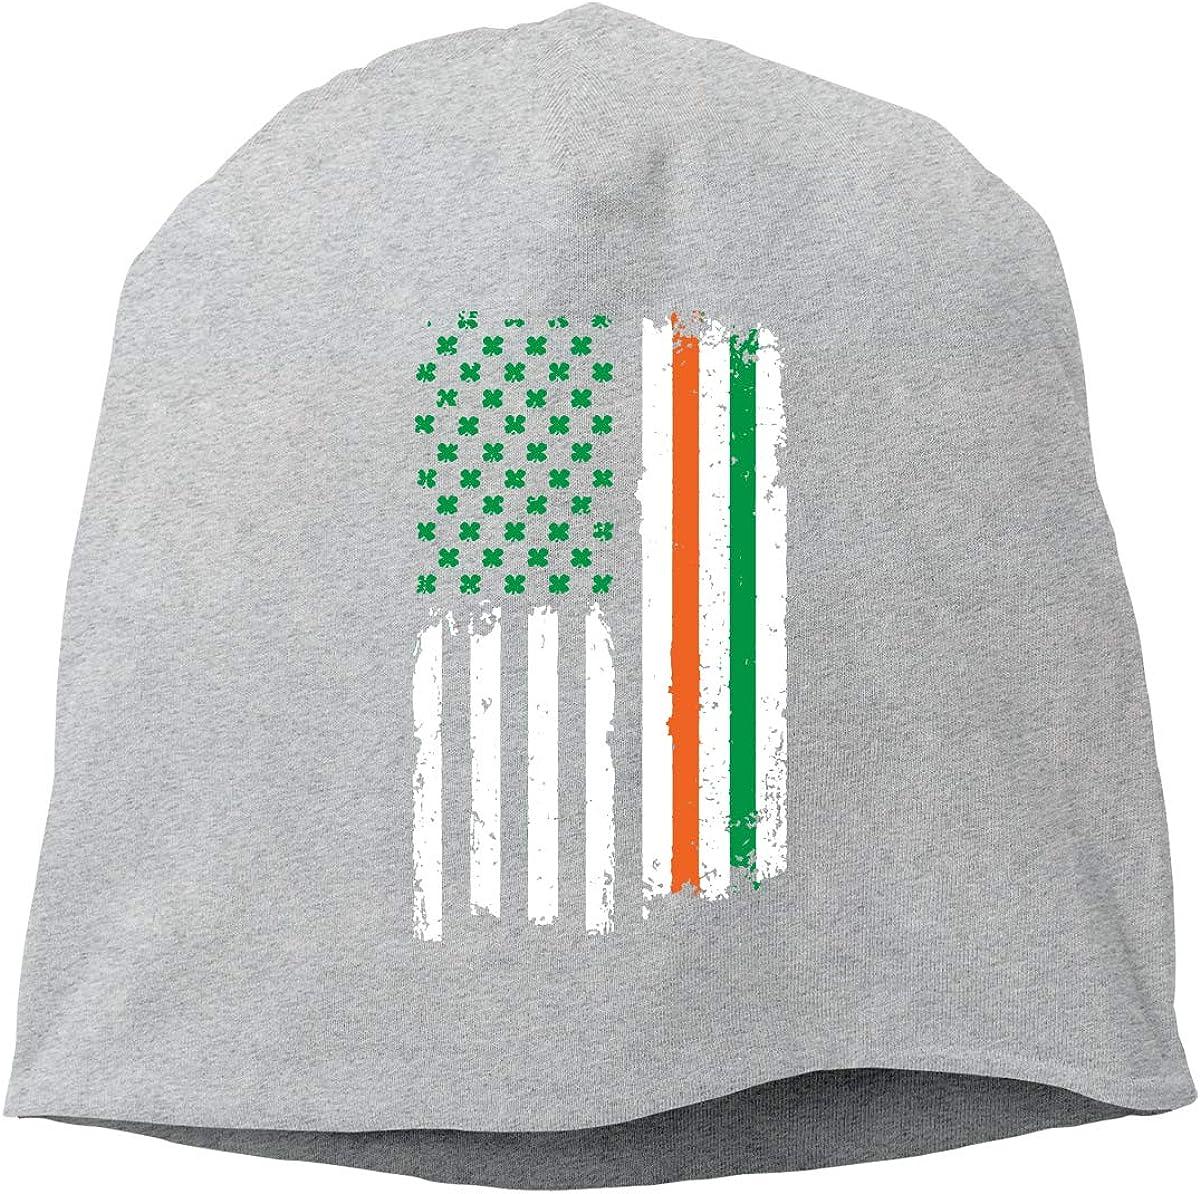 St Patricks Day Irish American USA Flag Unisex Knitted Hat Beanie Hat Warm Hats Skull Cap Beanie Hat